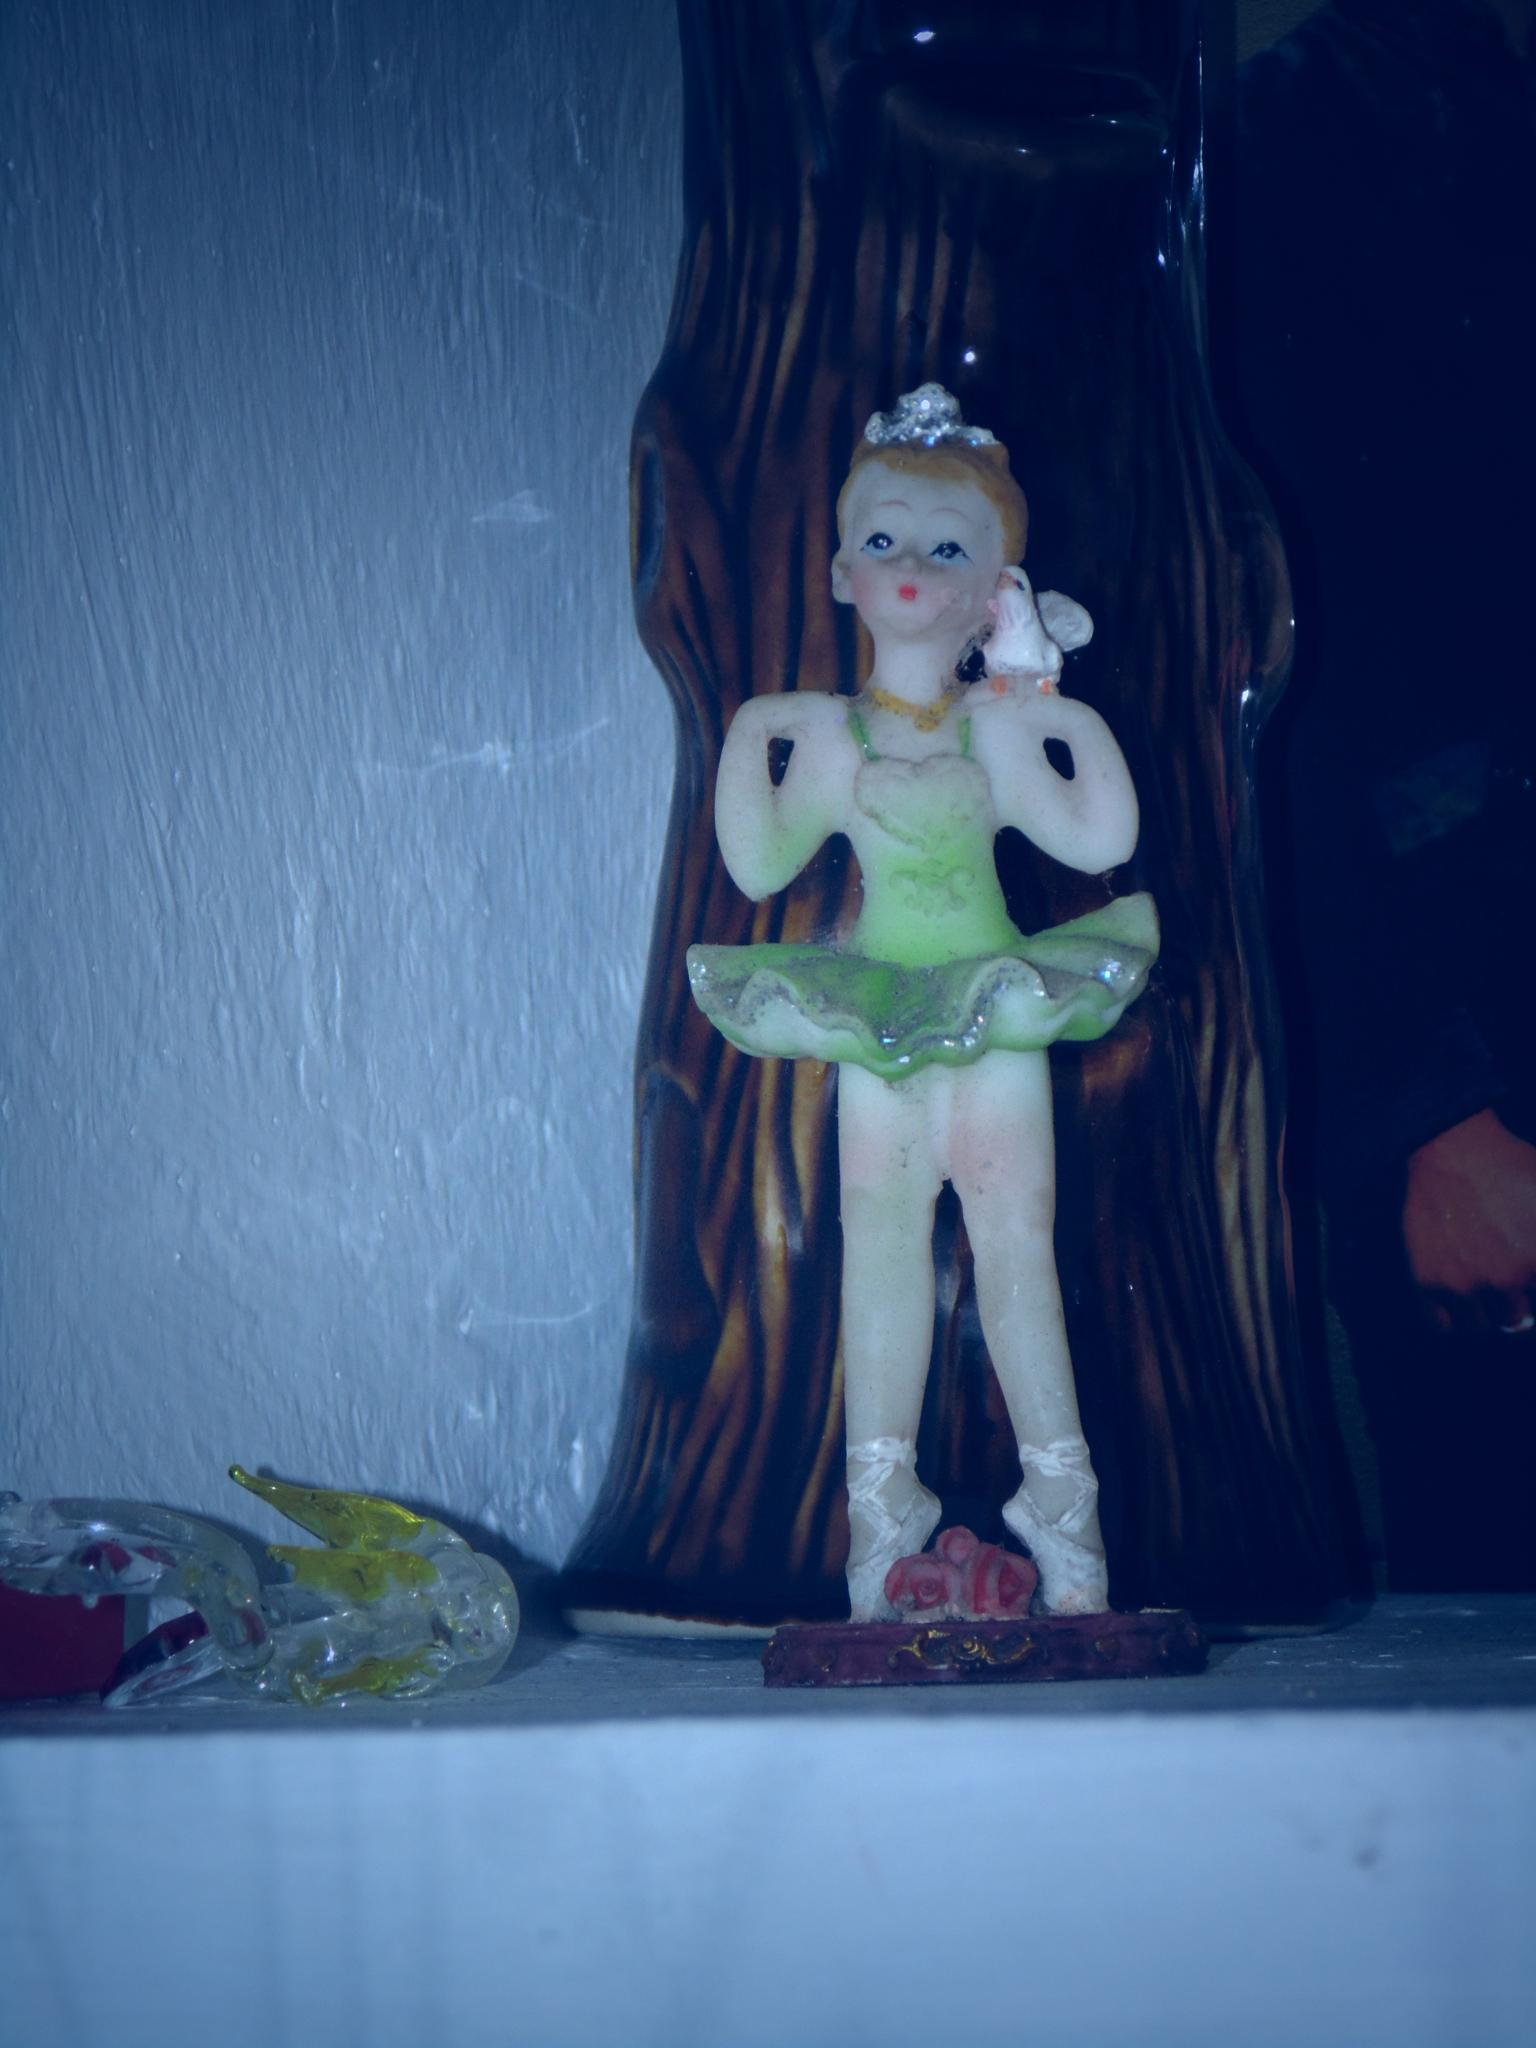 dancing queen by Charles Paul